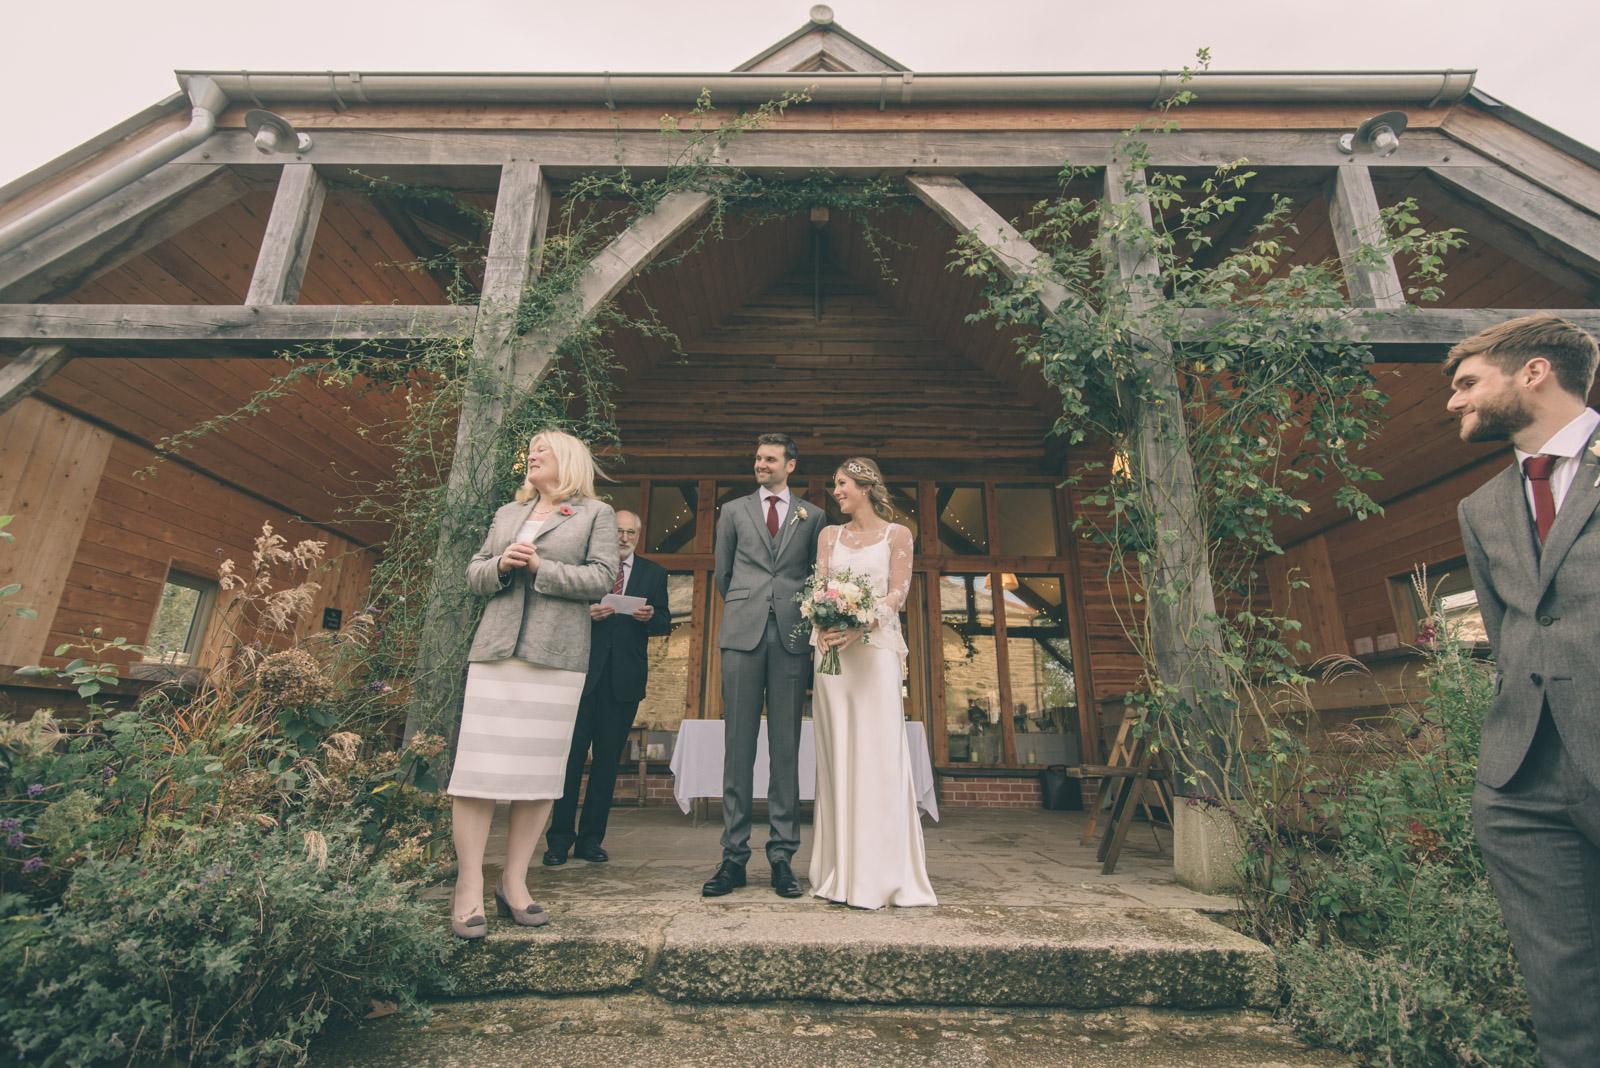 nancarrow-wedding-photography-74.jpg